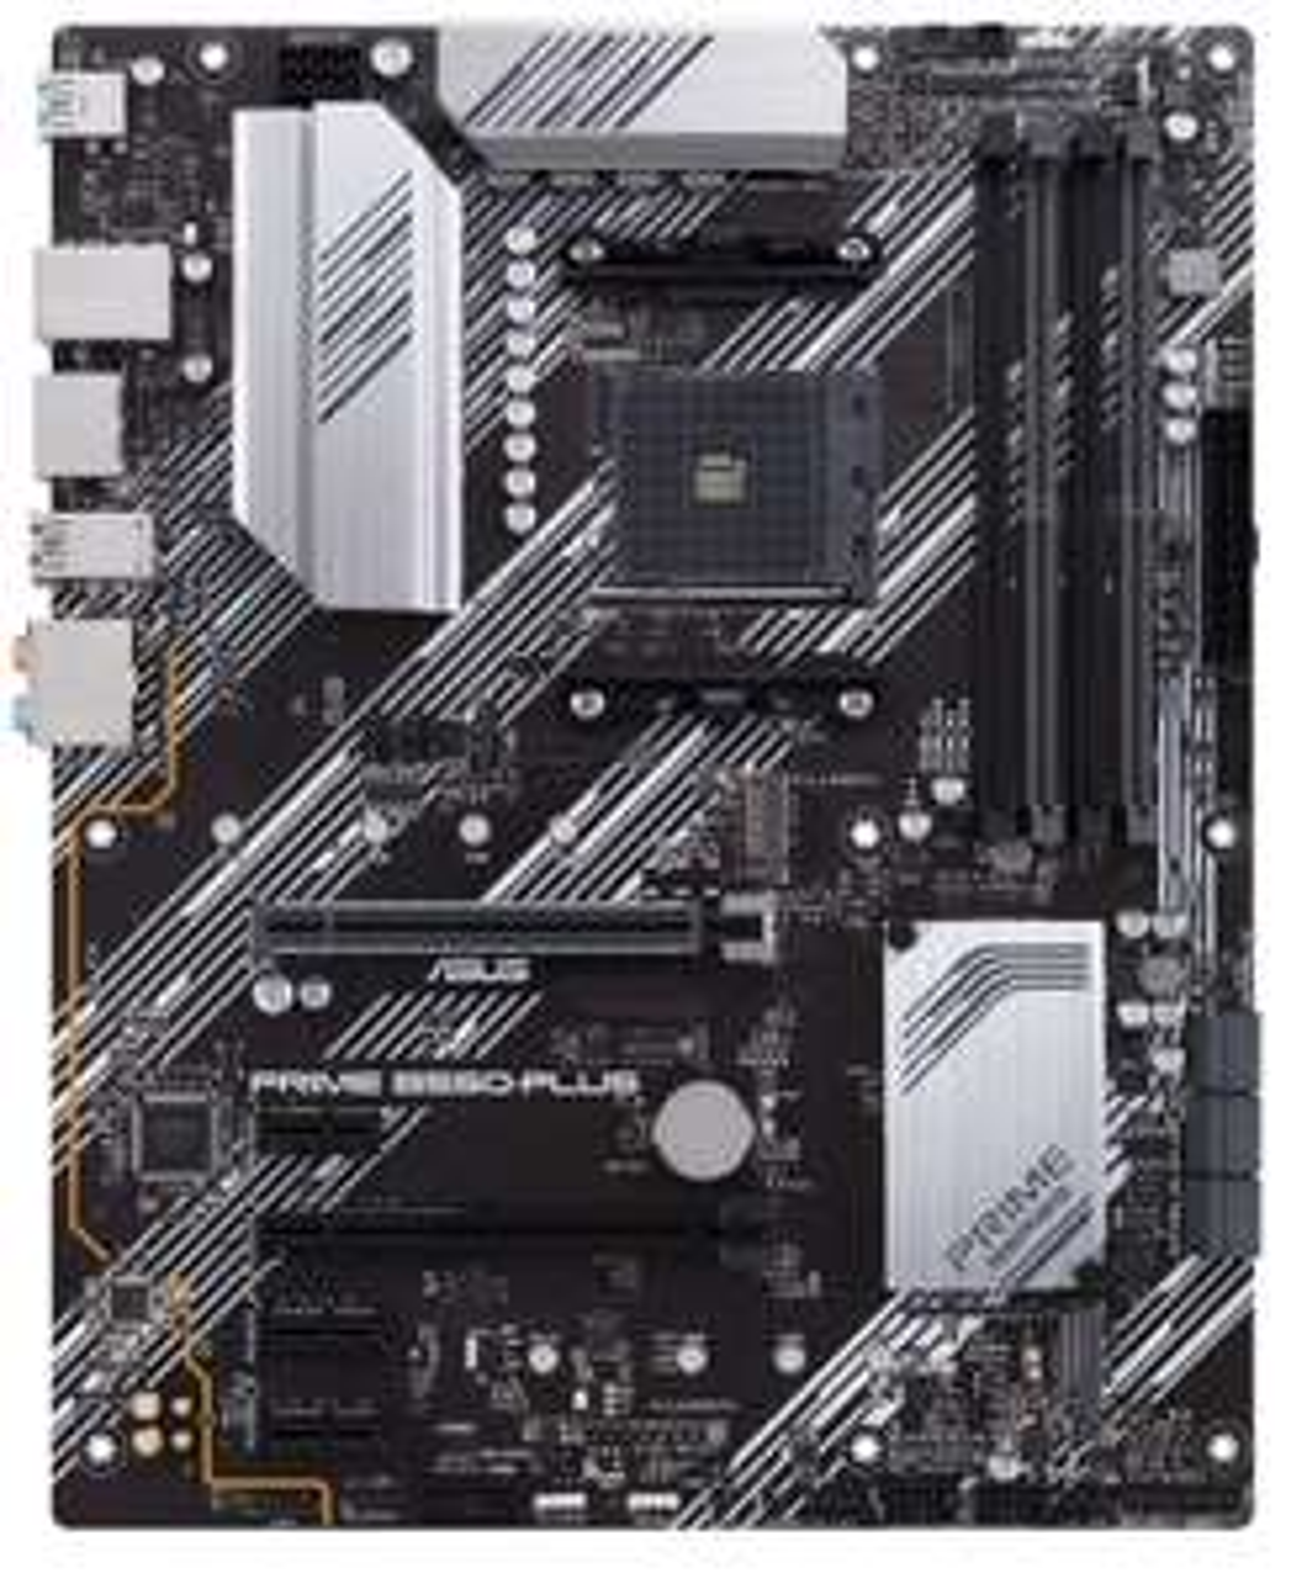 ASUS Prime B550-Plus (ATX, Ryzen, PCIe 4.0, 2x M-2, 1Gbit/s-Ethernet, SATA 6Gbit/s, USB 3.2 Gen 2 Typ-A/C)